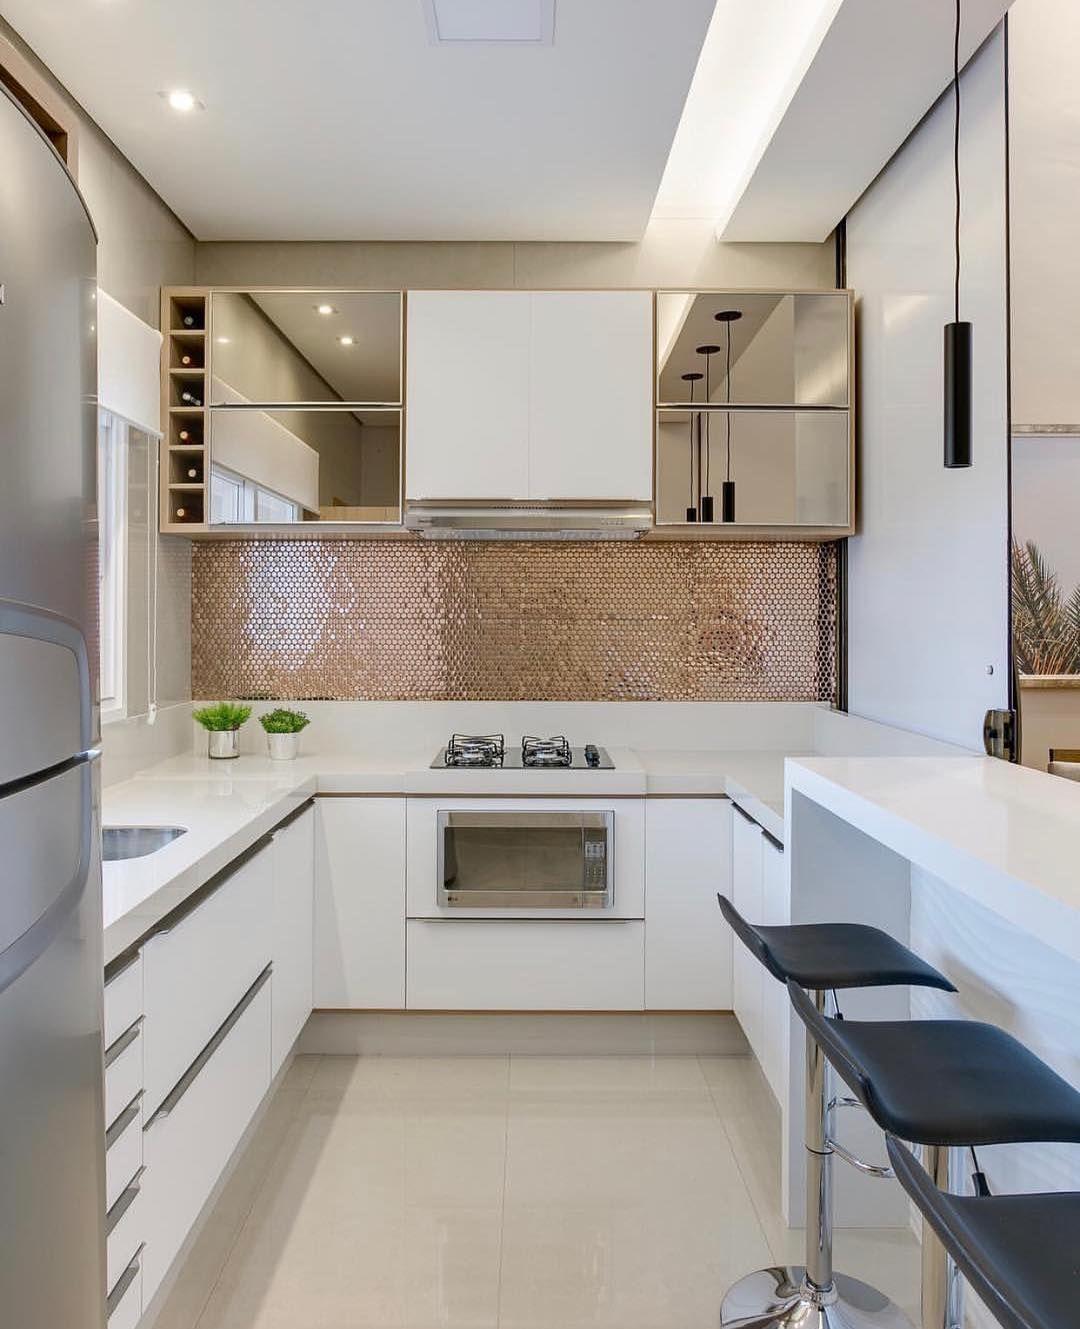 Pin de valeri martinez en deco cocinas modernas cocinas for Remodelacion de casas pequenas